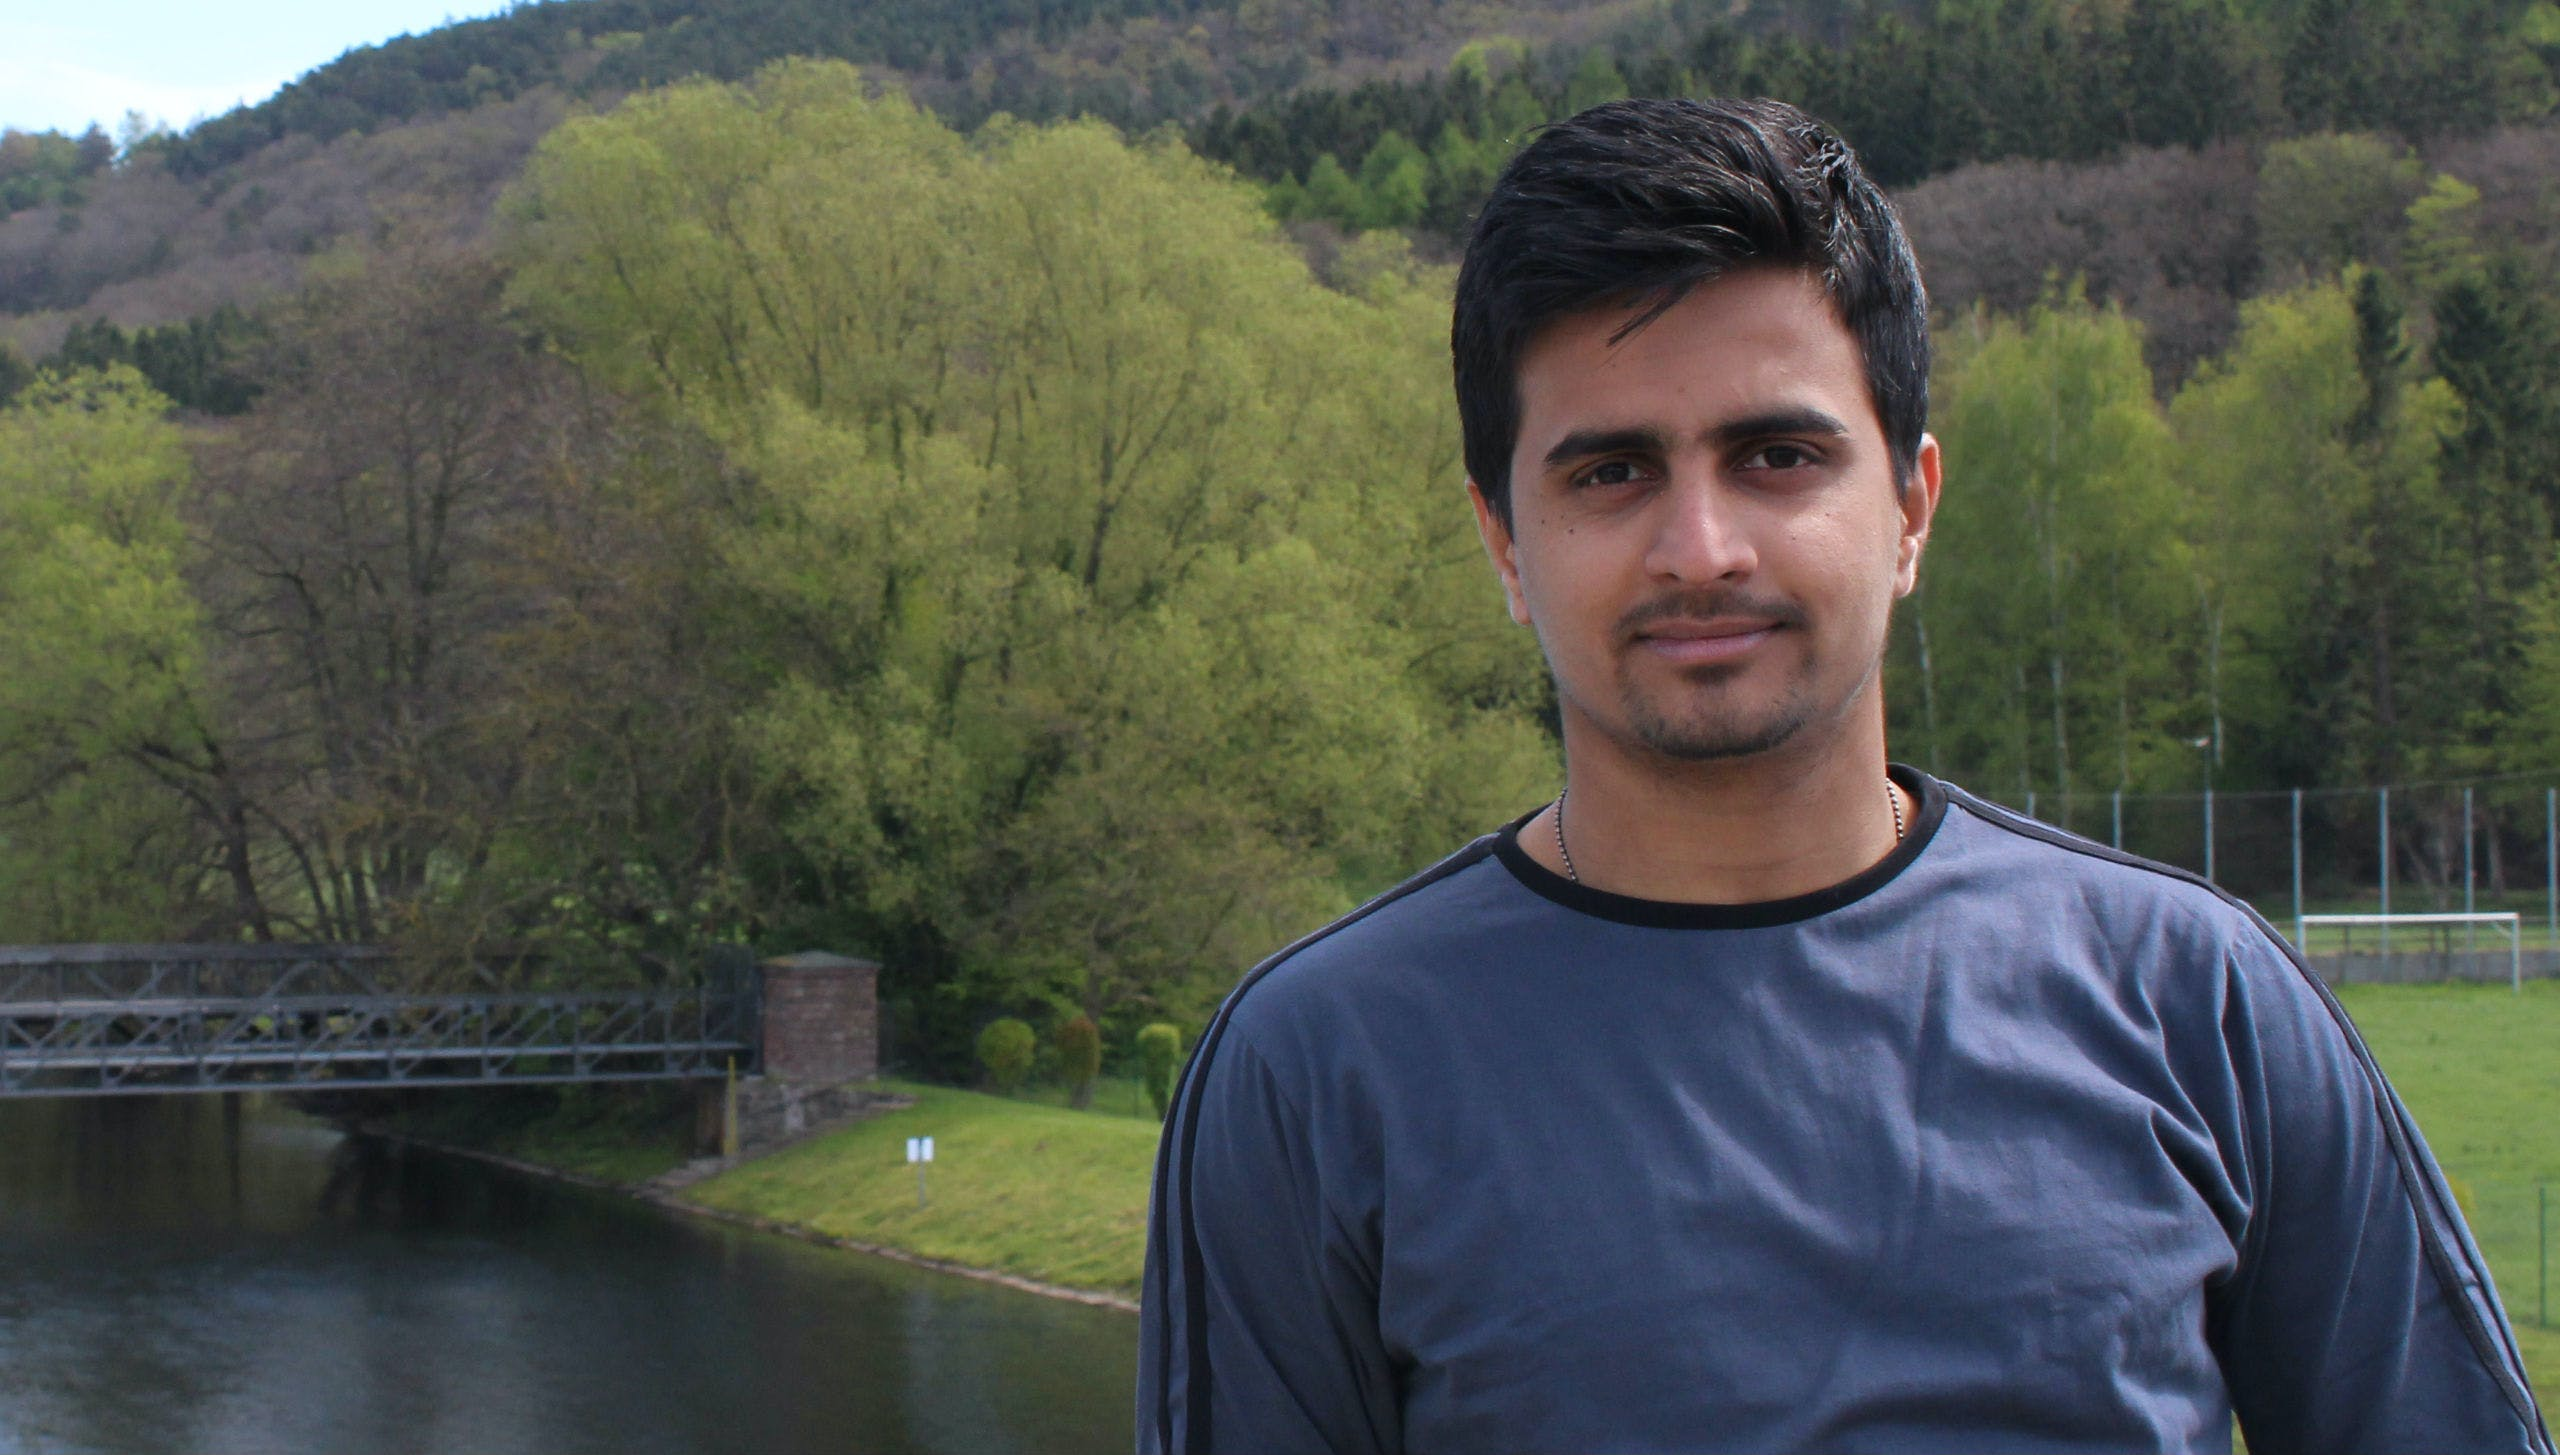 RWTH Aachen University, Germany: Study Experience of Madvesh